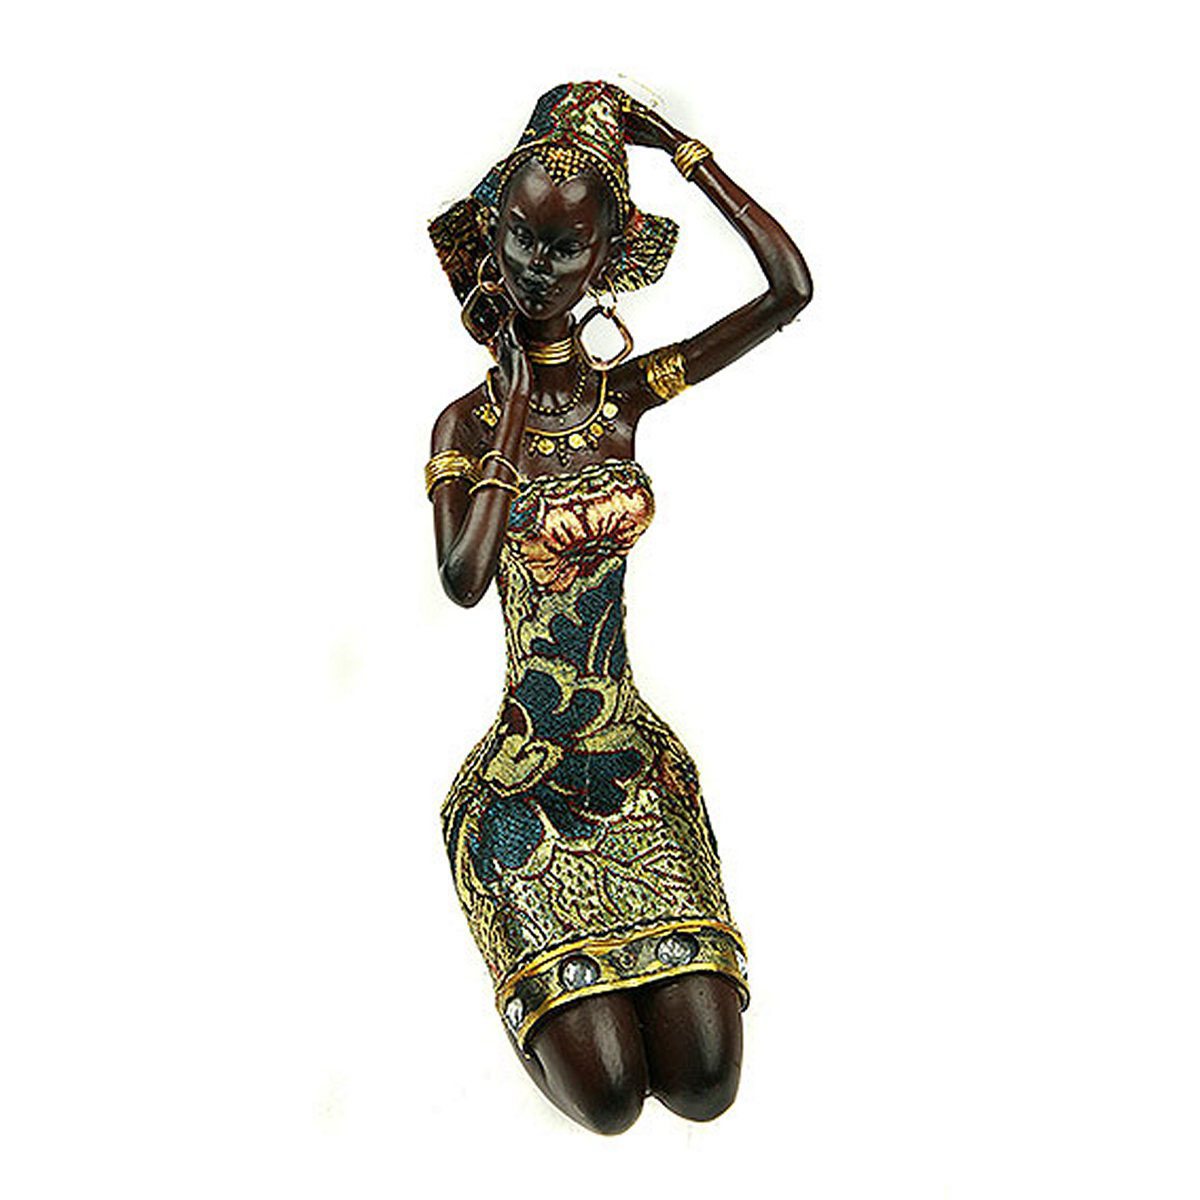 Статуэтка Русские Подарки Африканка, 12 х 12 х 23 см статуэтка lefard африканка 174 311